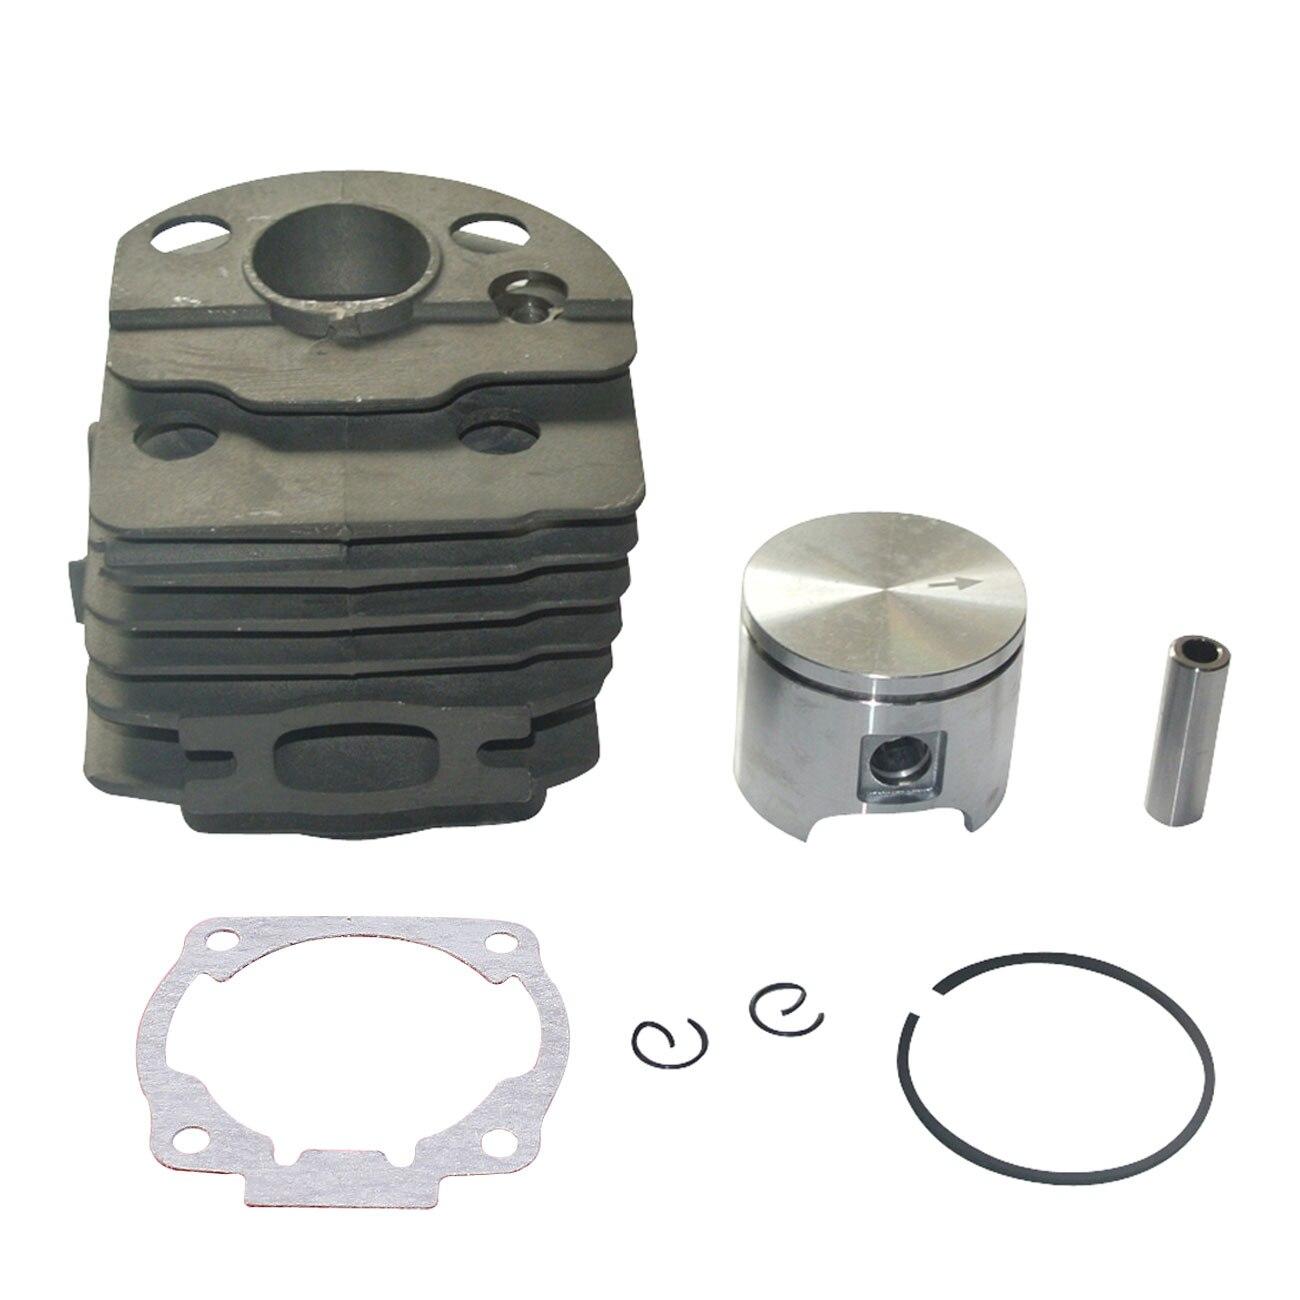 Engine Motor Cylinder Kit Piston Kit W/ Rings 46MM For Husqvarna 51 55 Chiansaw